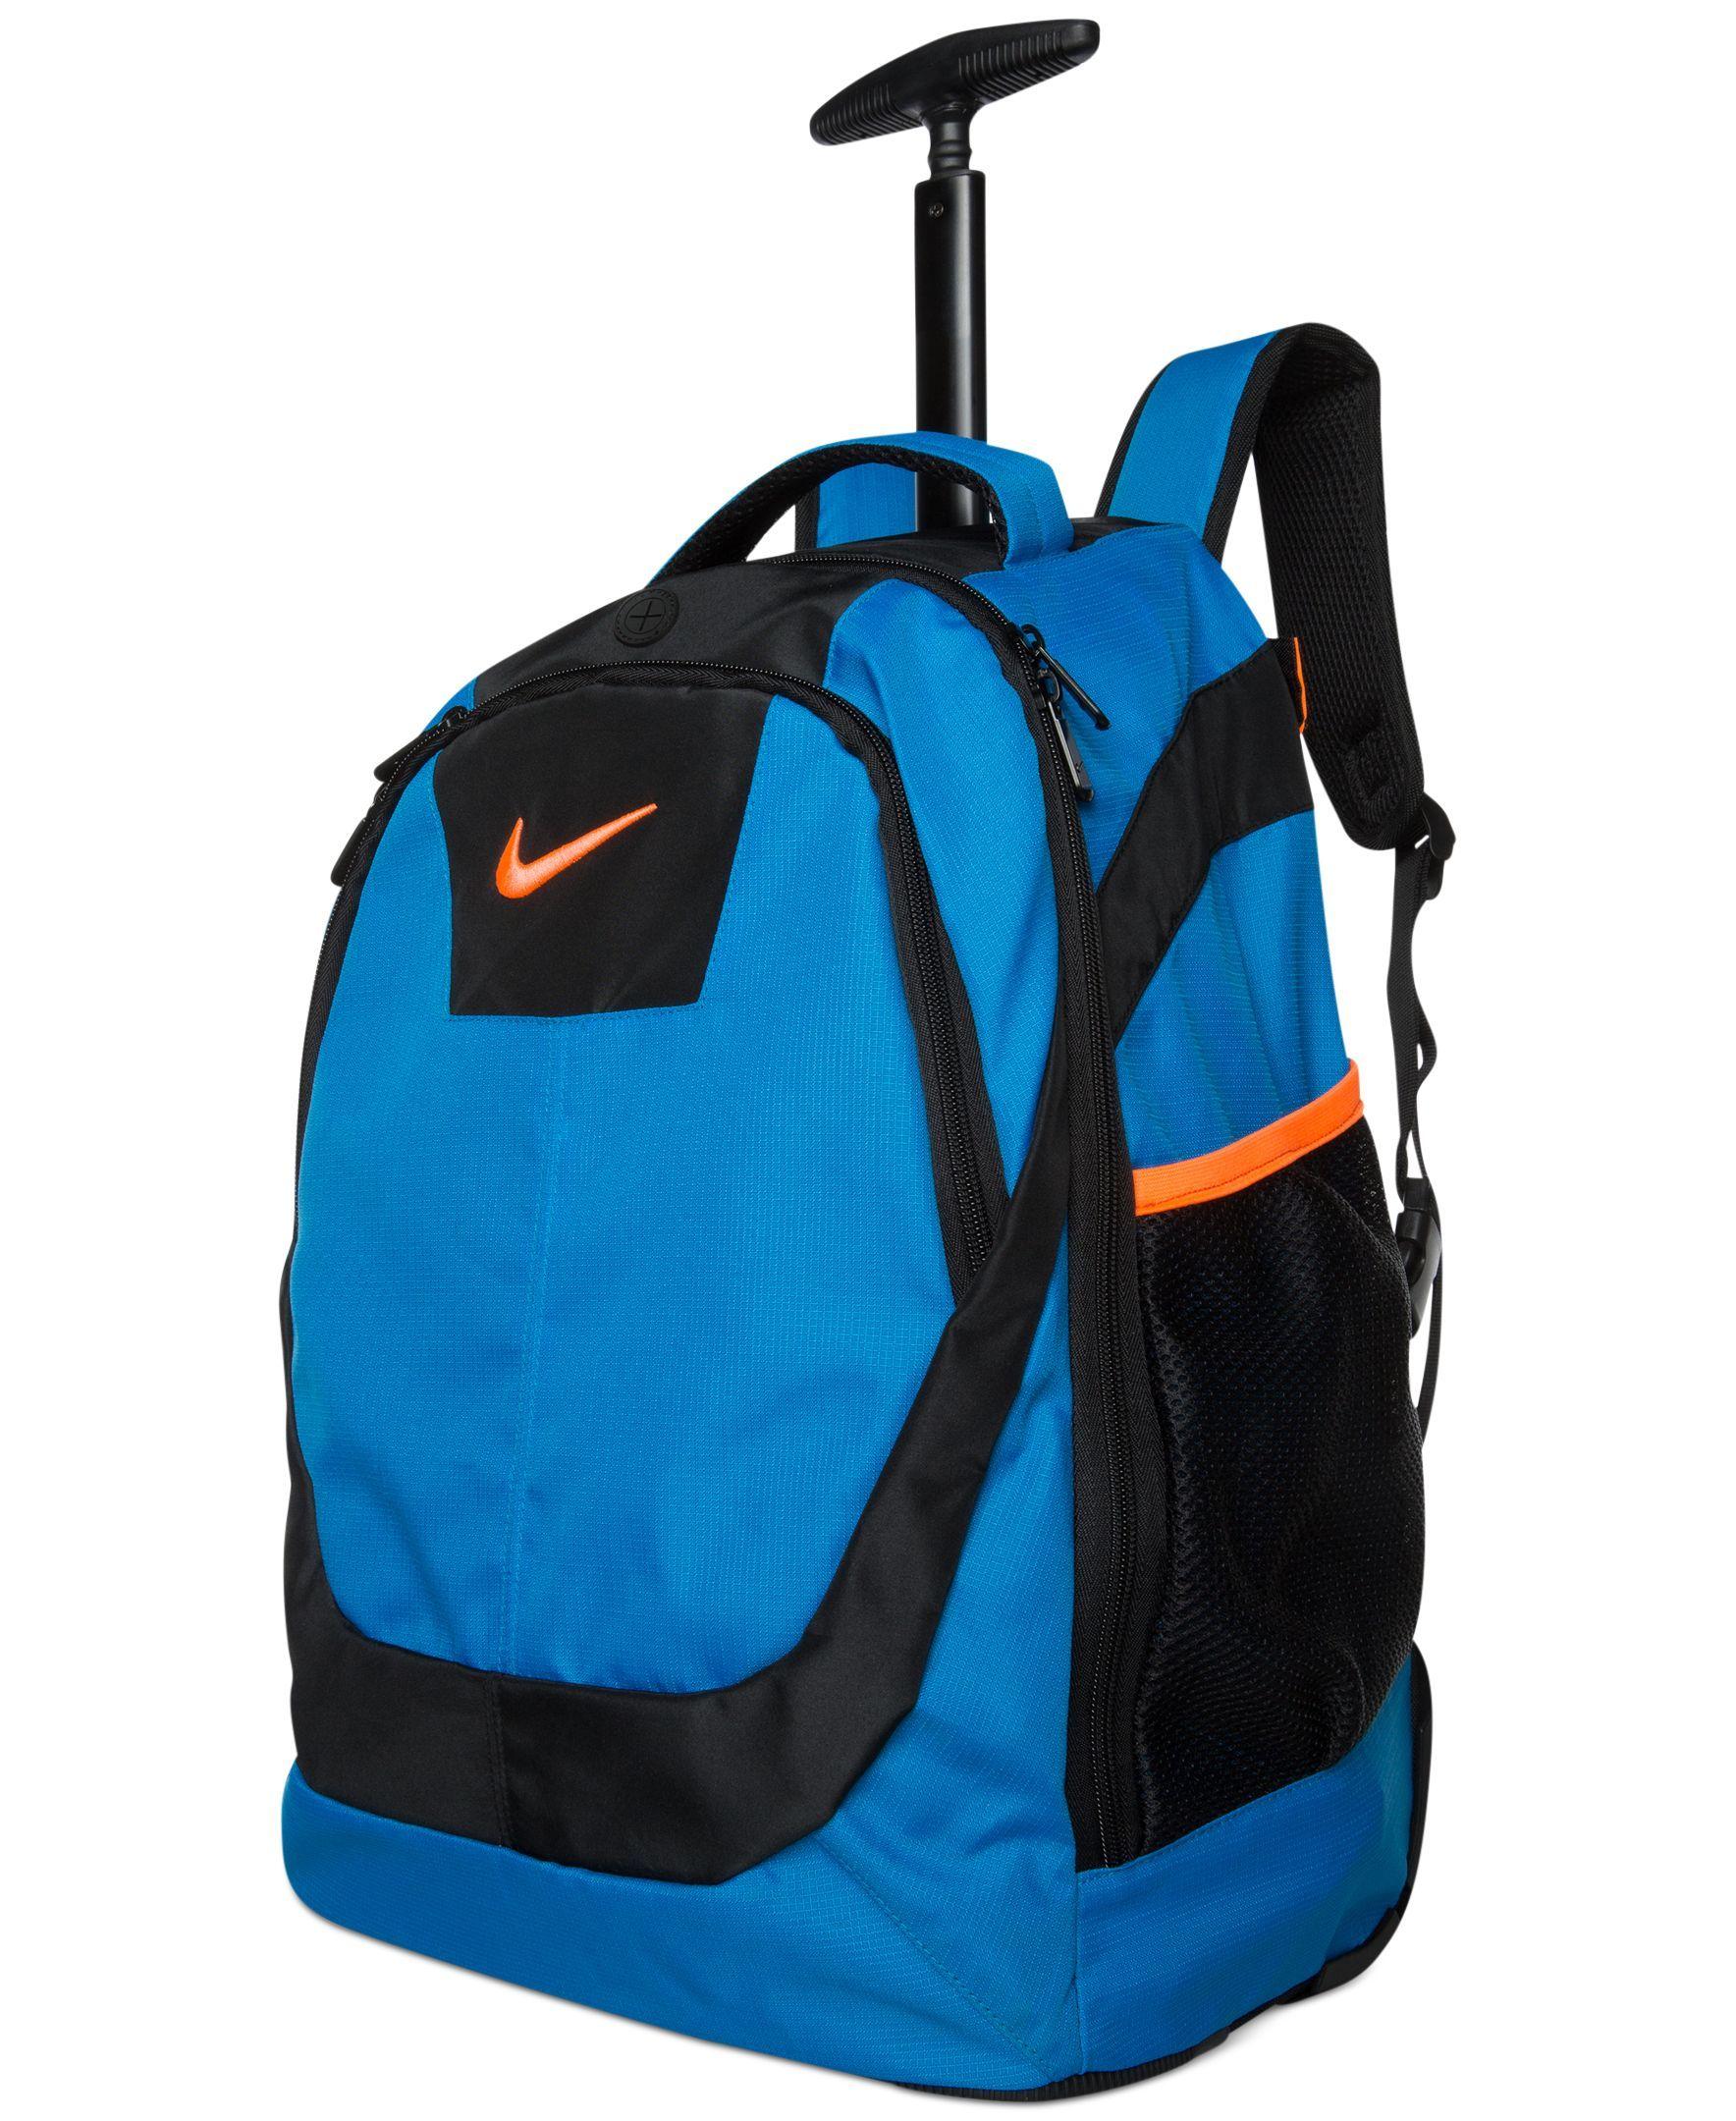 b439a07b383e Nike Rolling Backpacks For School- Fenix Toulouse Handball